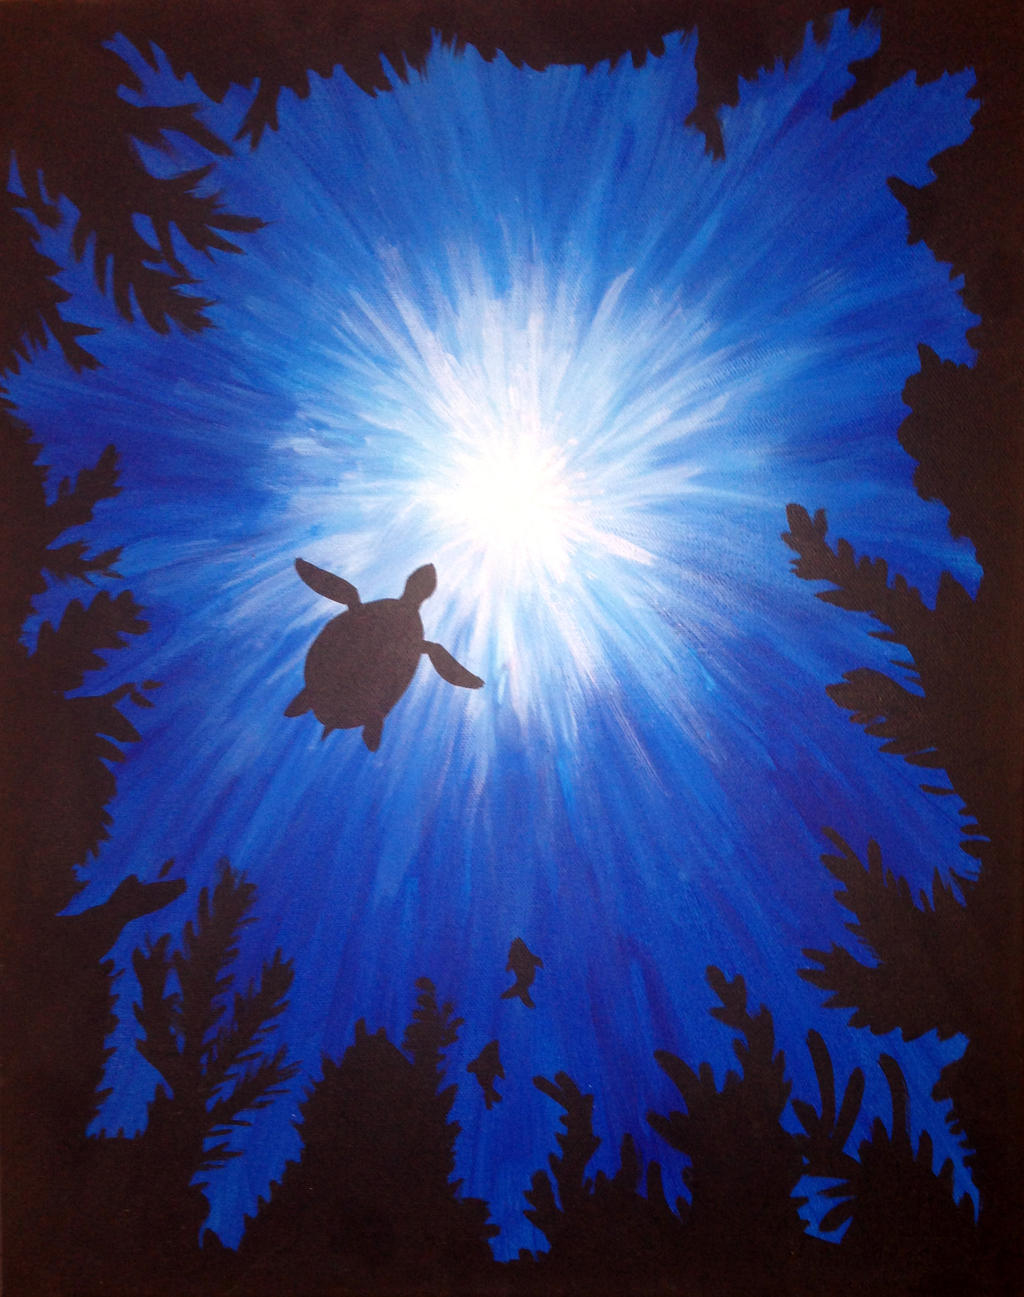 Deep Blue by 102vvv